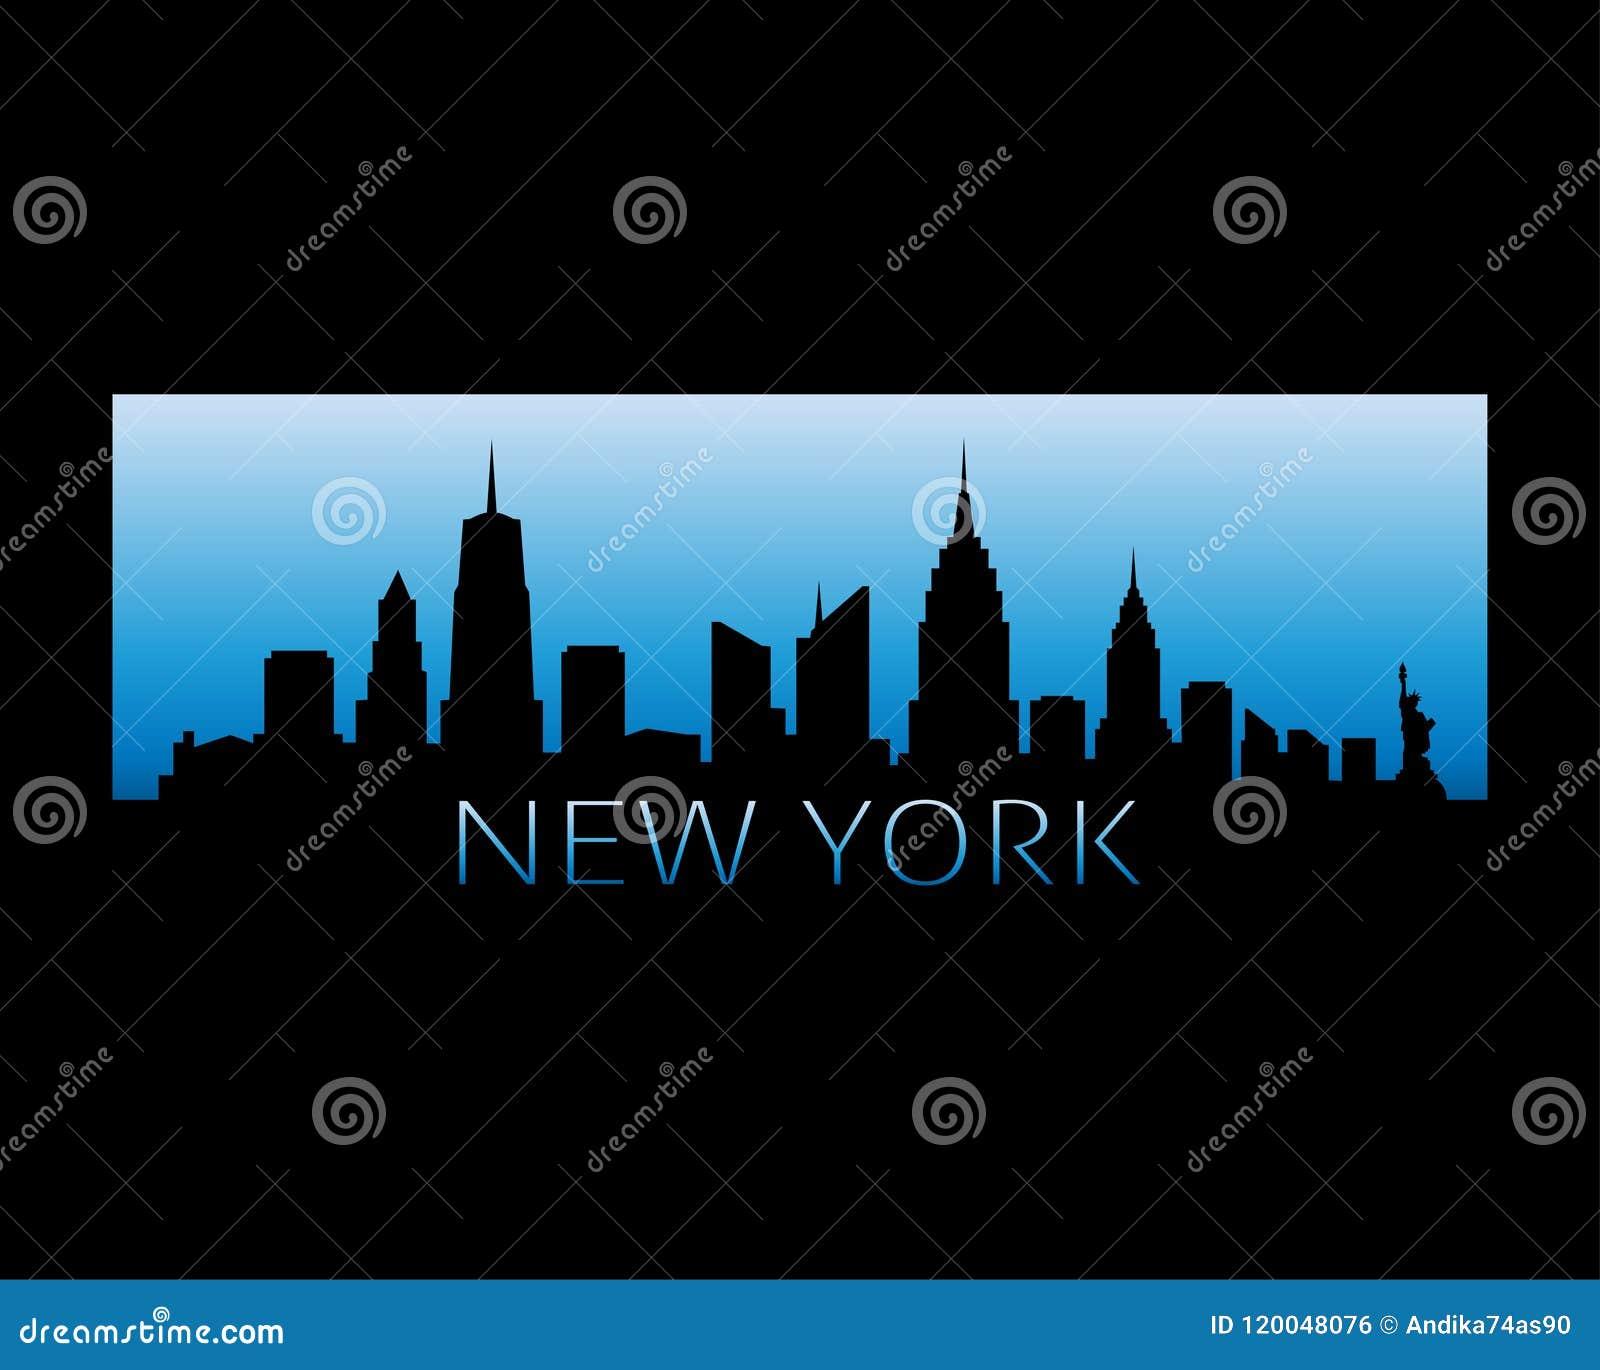 New York City Skyline Vector Illustration Stock Vector